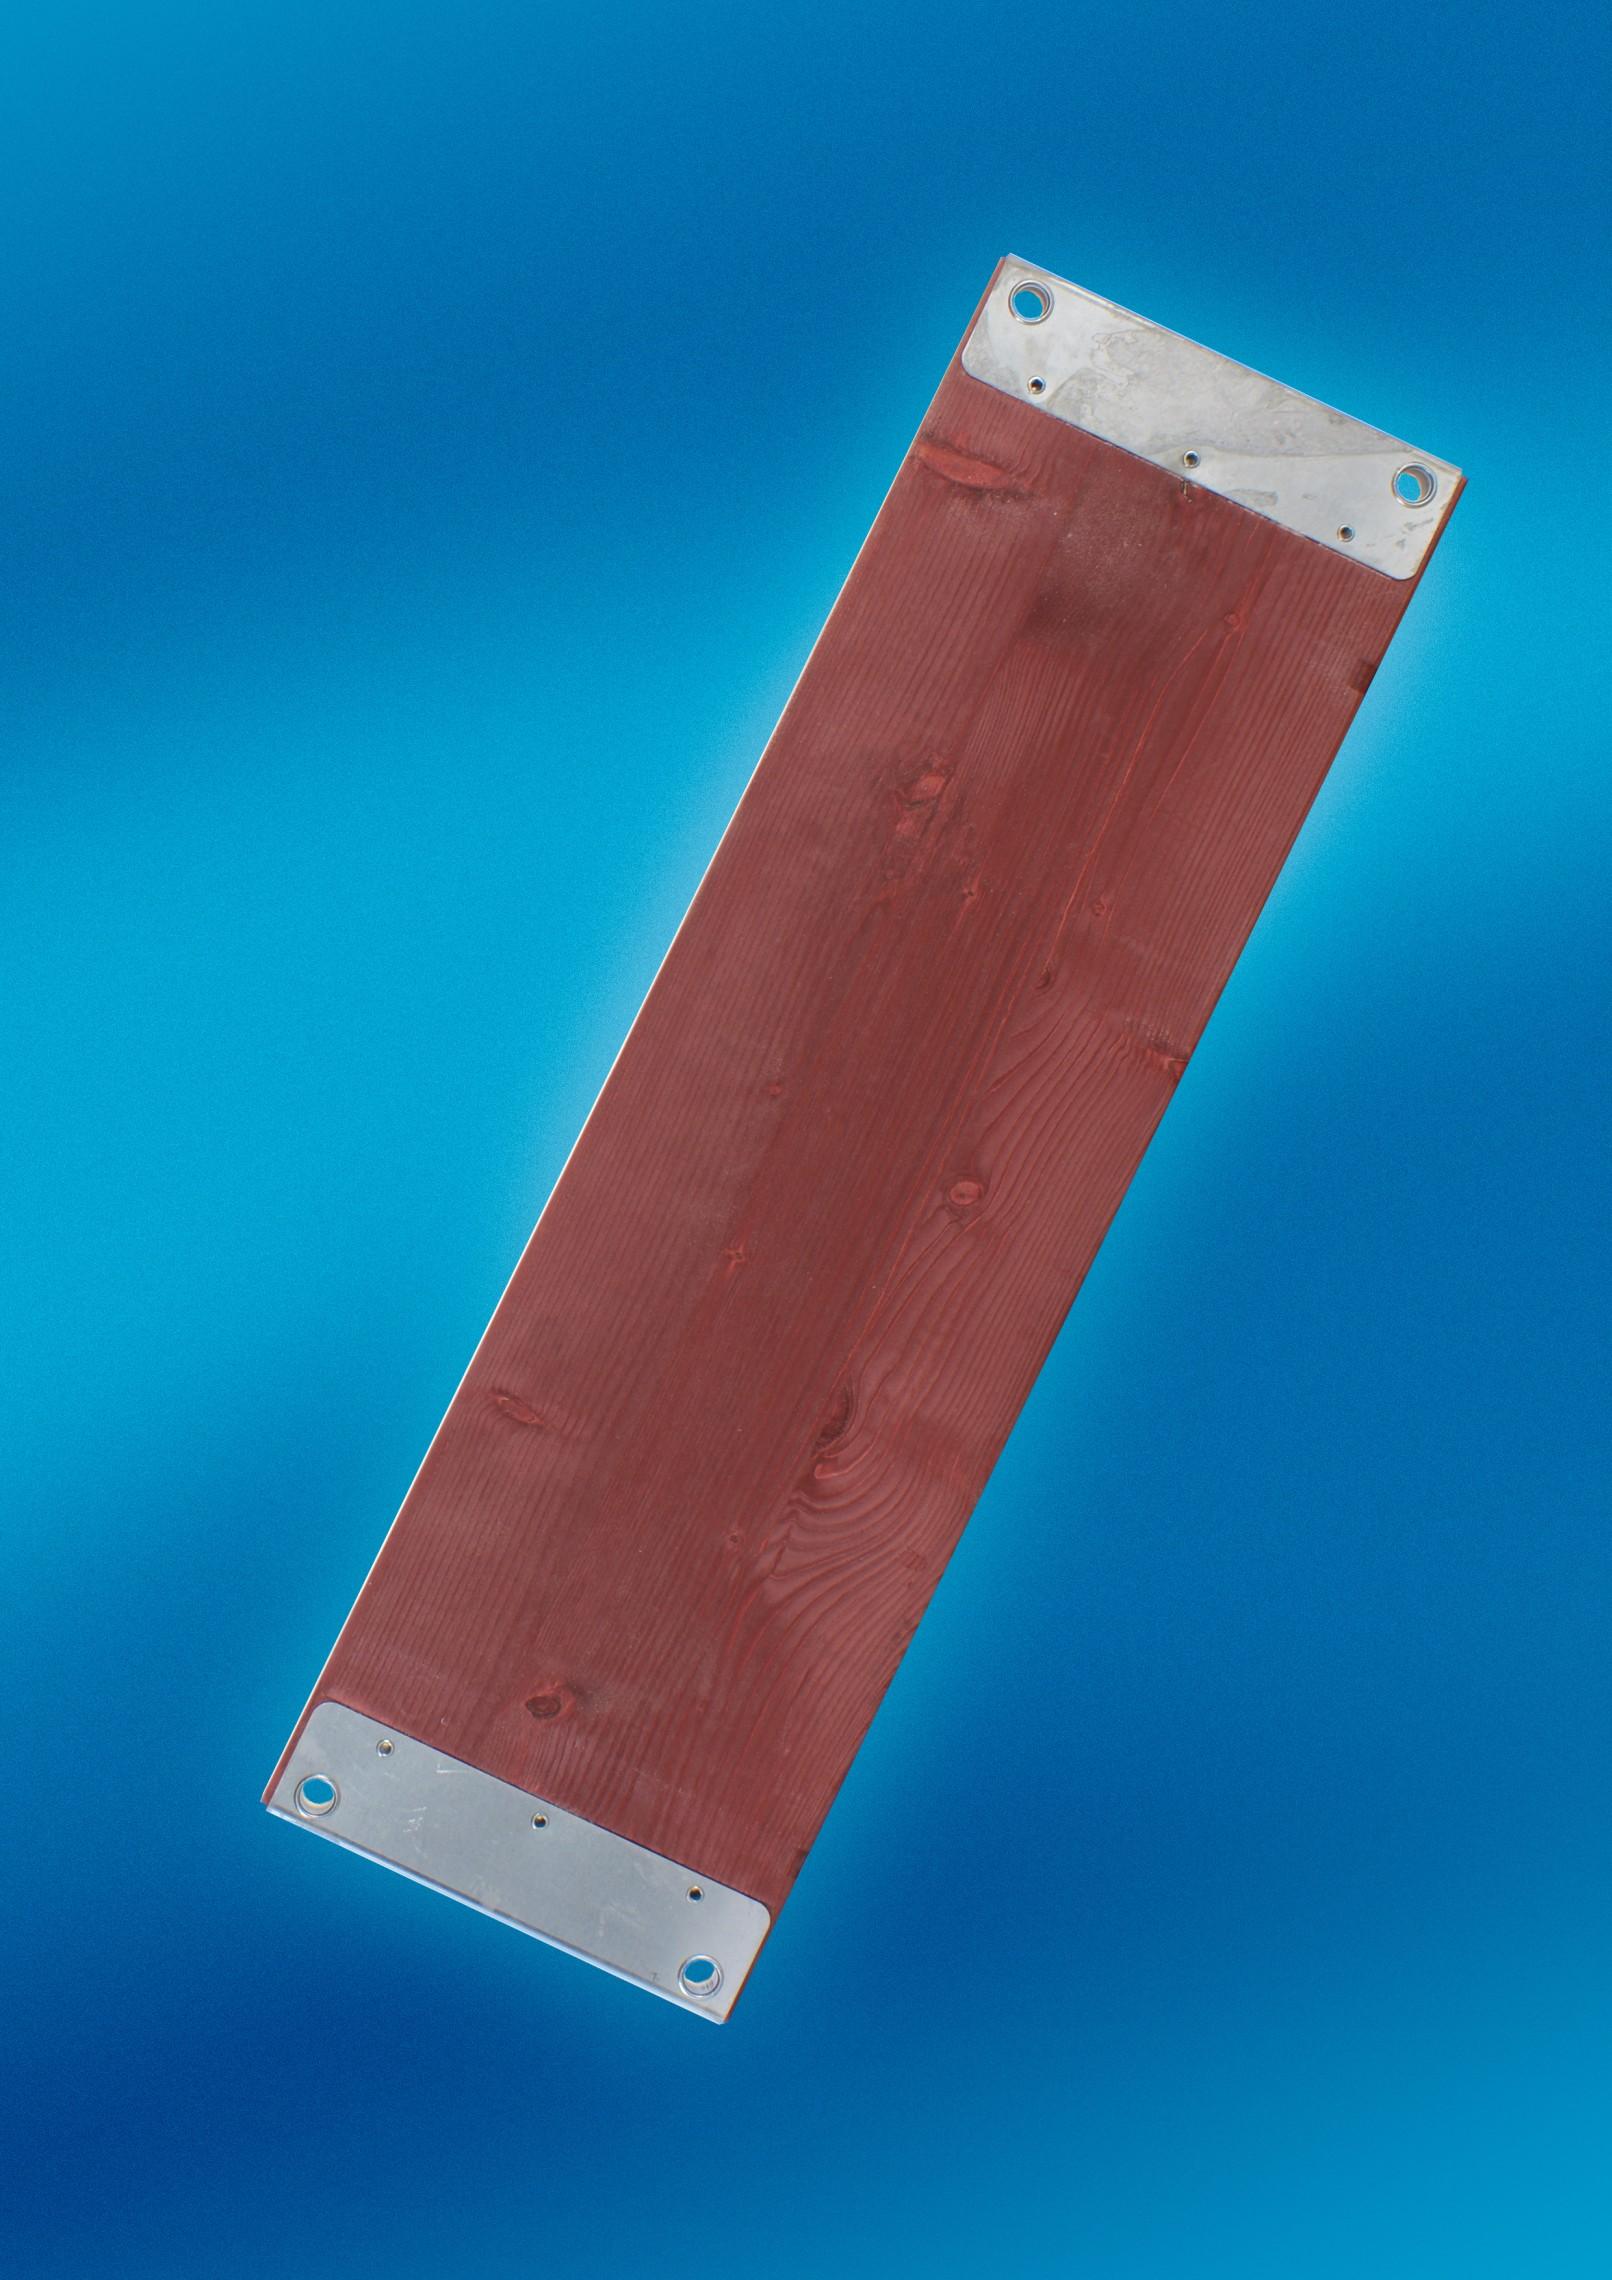 10-podest-drewniany-system700-070mx032m-_110mx032m-_150mx032m-_200mx032m-_250mx032m-_300mx032m